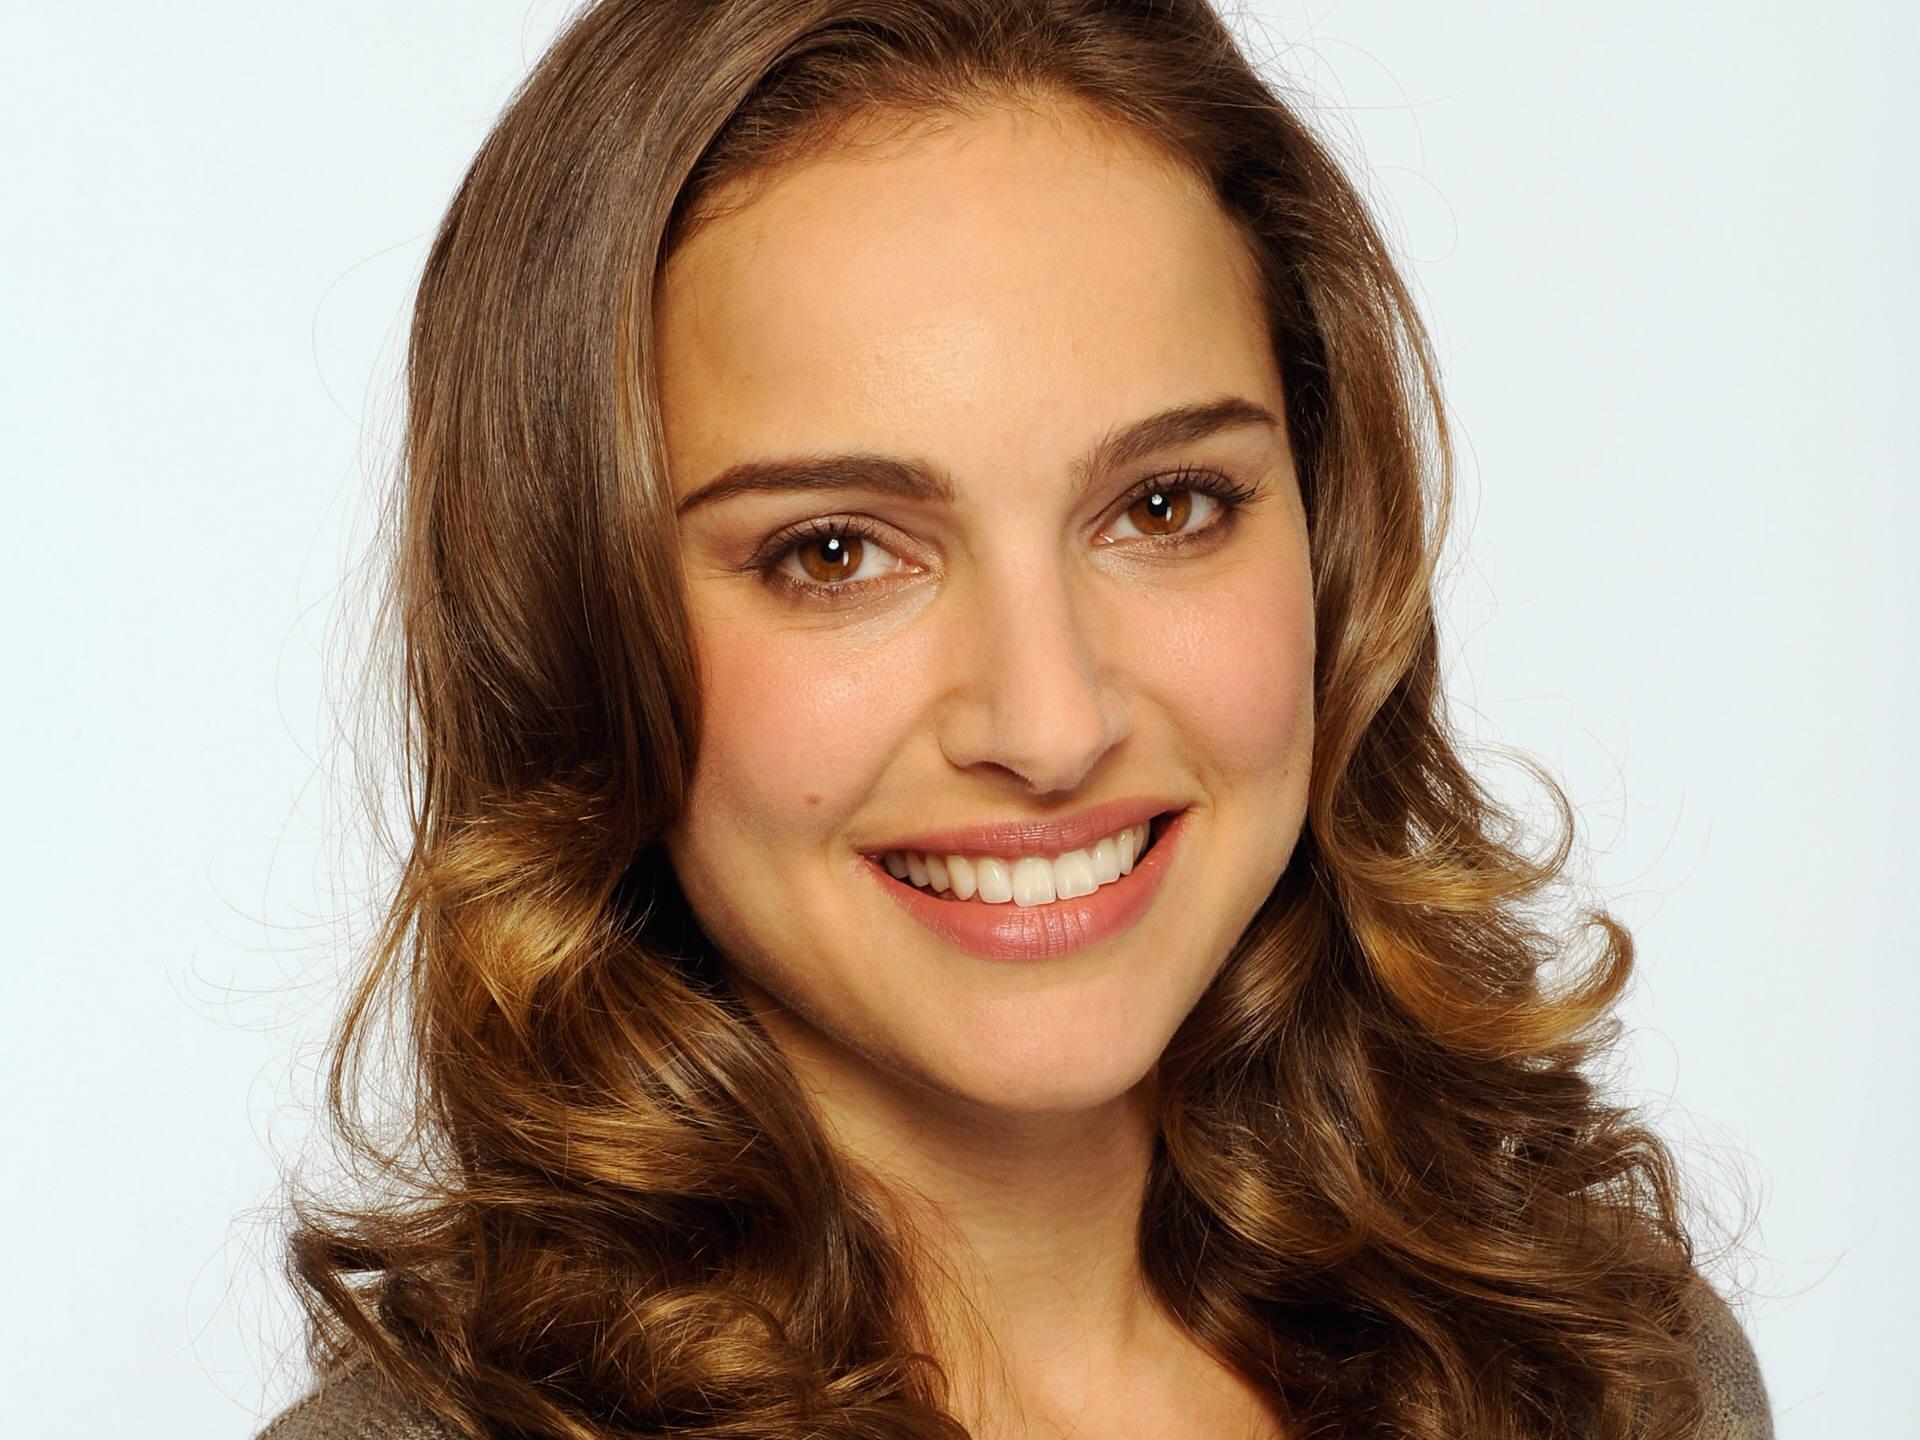 Natalie Portman buys into vegan shoe business